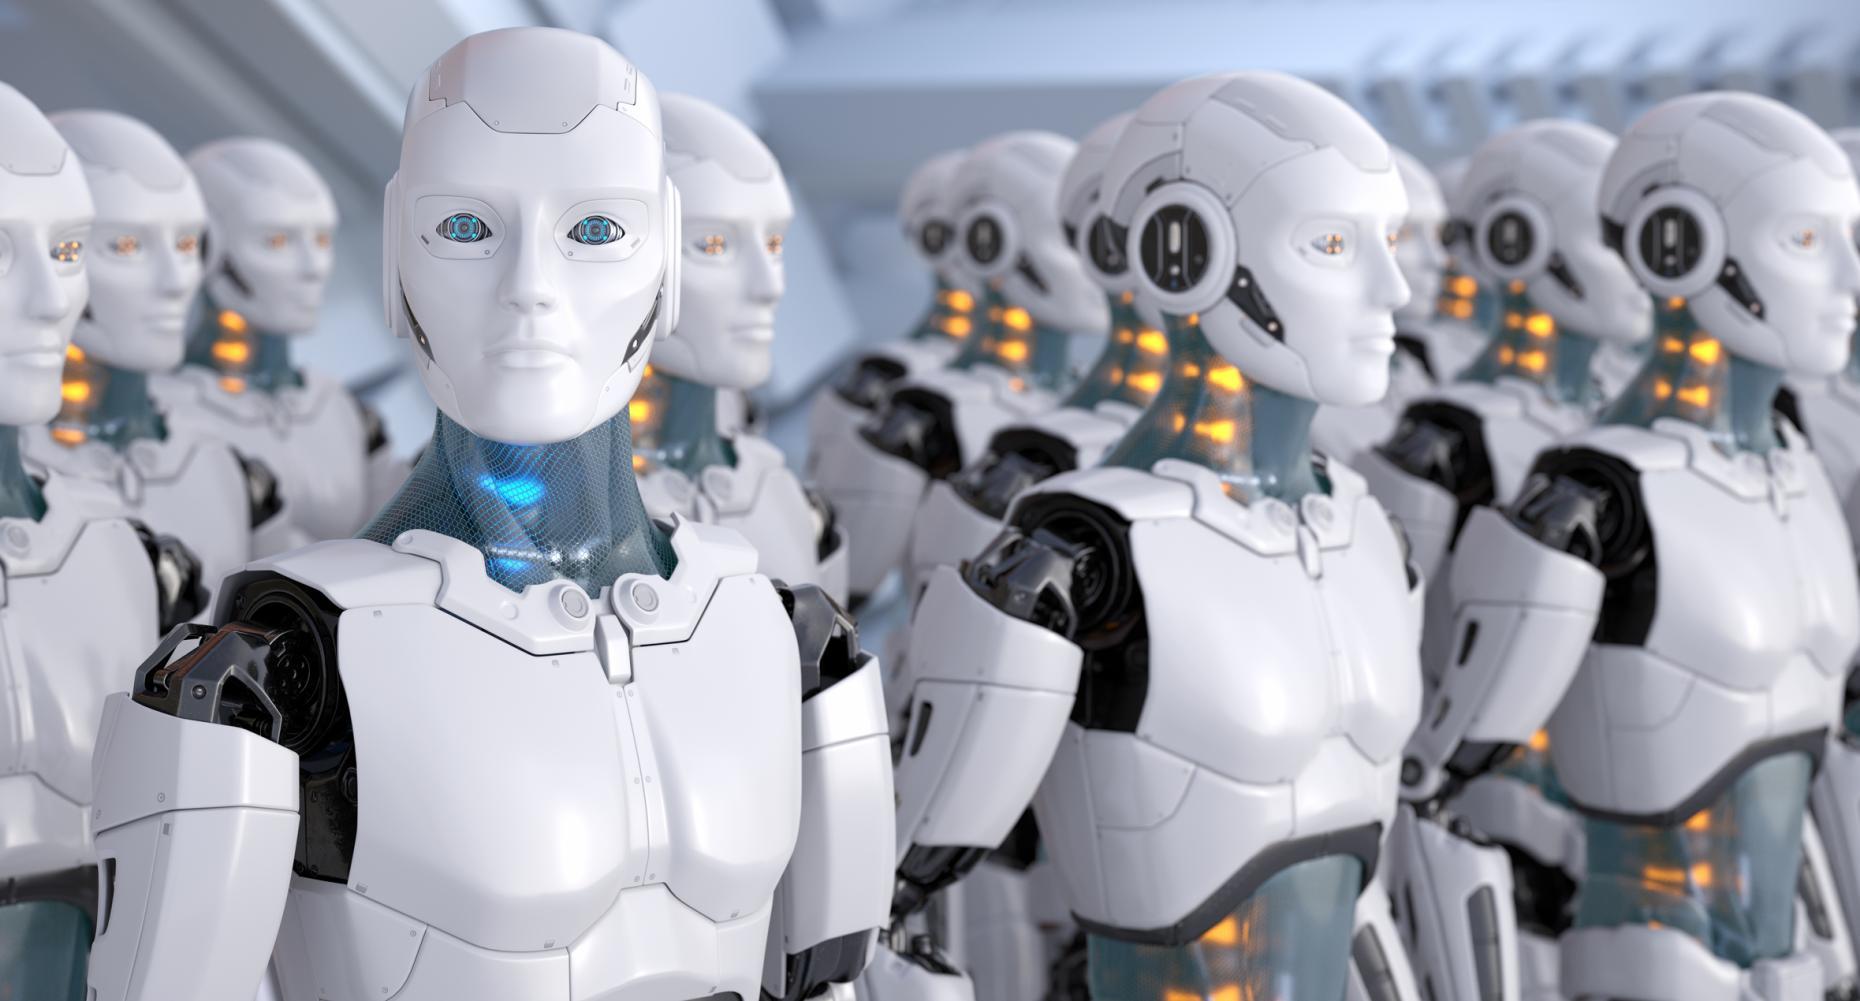 https://cdn.businessinsider.es/sites/navi.axelspringer.es/public/styles/bi_1860/public/media/image/2021/01/robot-inteligencia-artificial-2197973.jpg?itok=J0WfxP5O